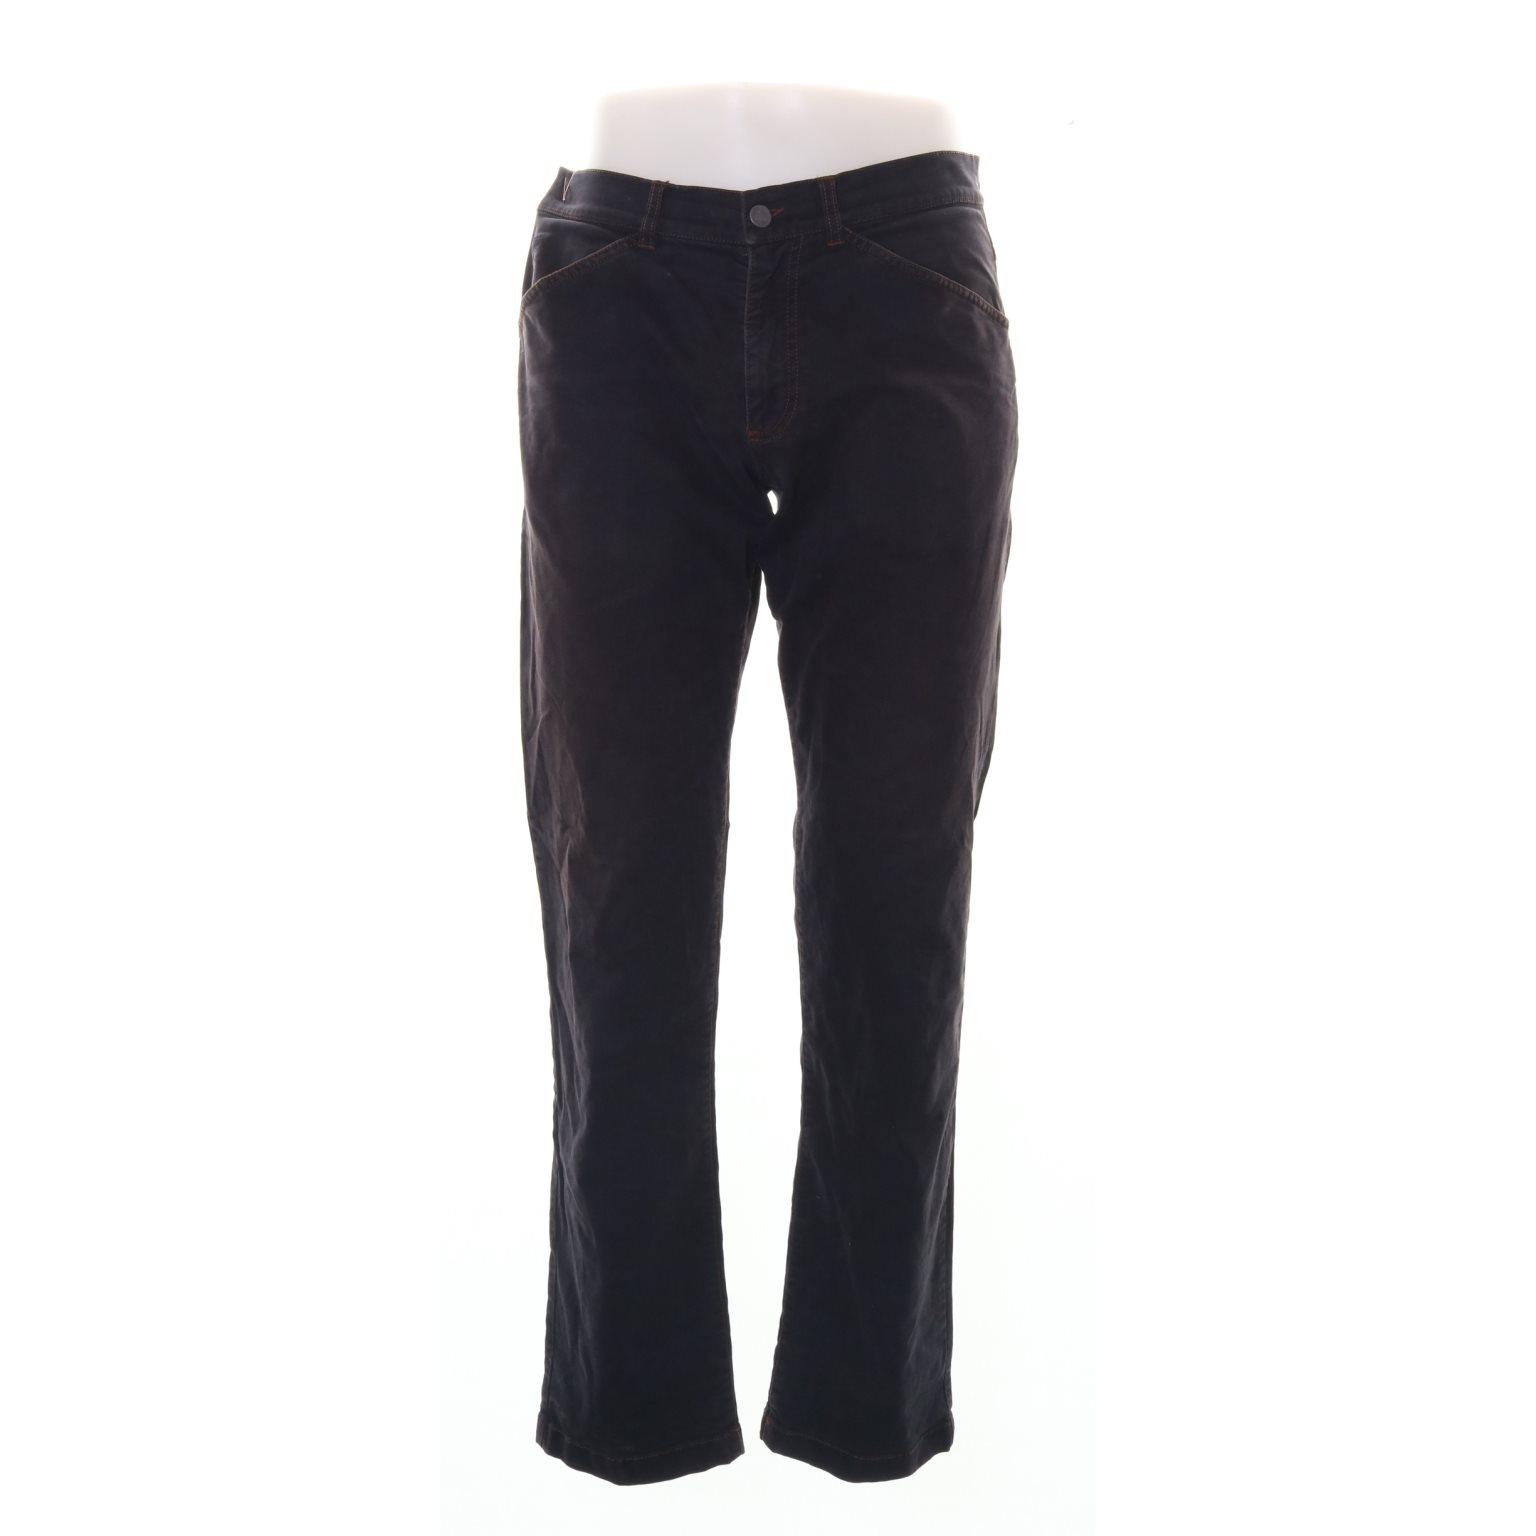 e6a6c53b086 Versace Sport, Jeans, Strl: 35, Grå (338179042) ᐈ Sellpy på Tradera